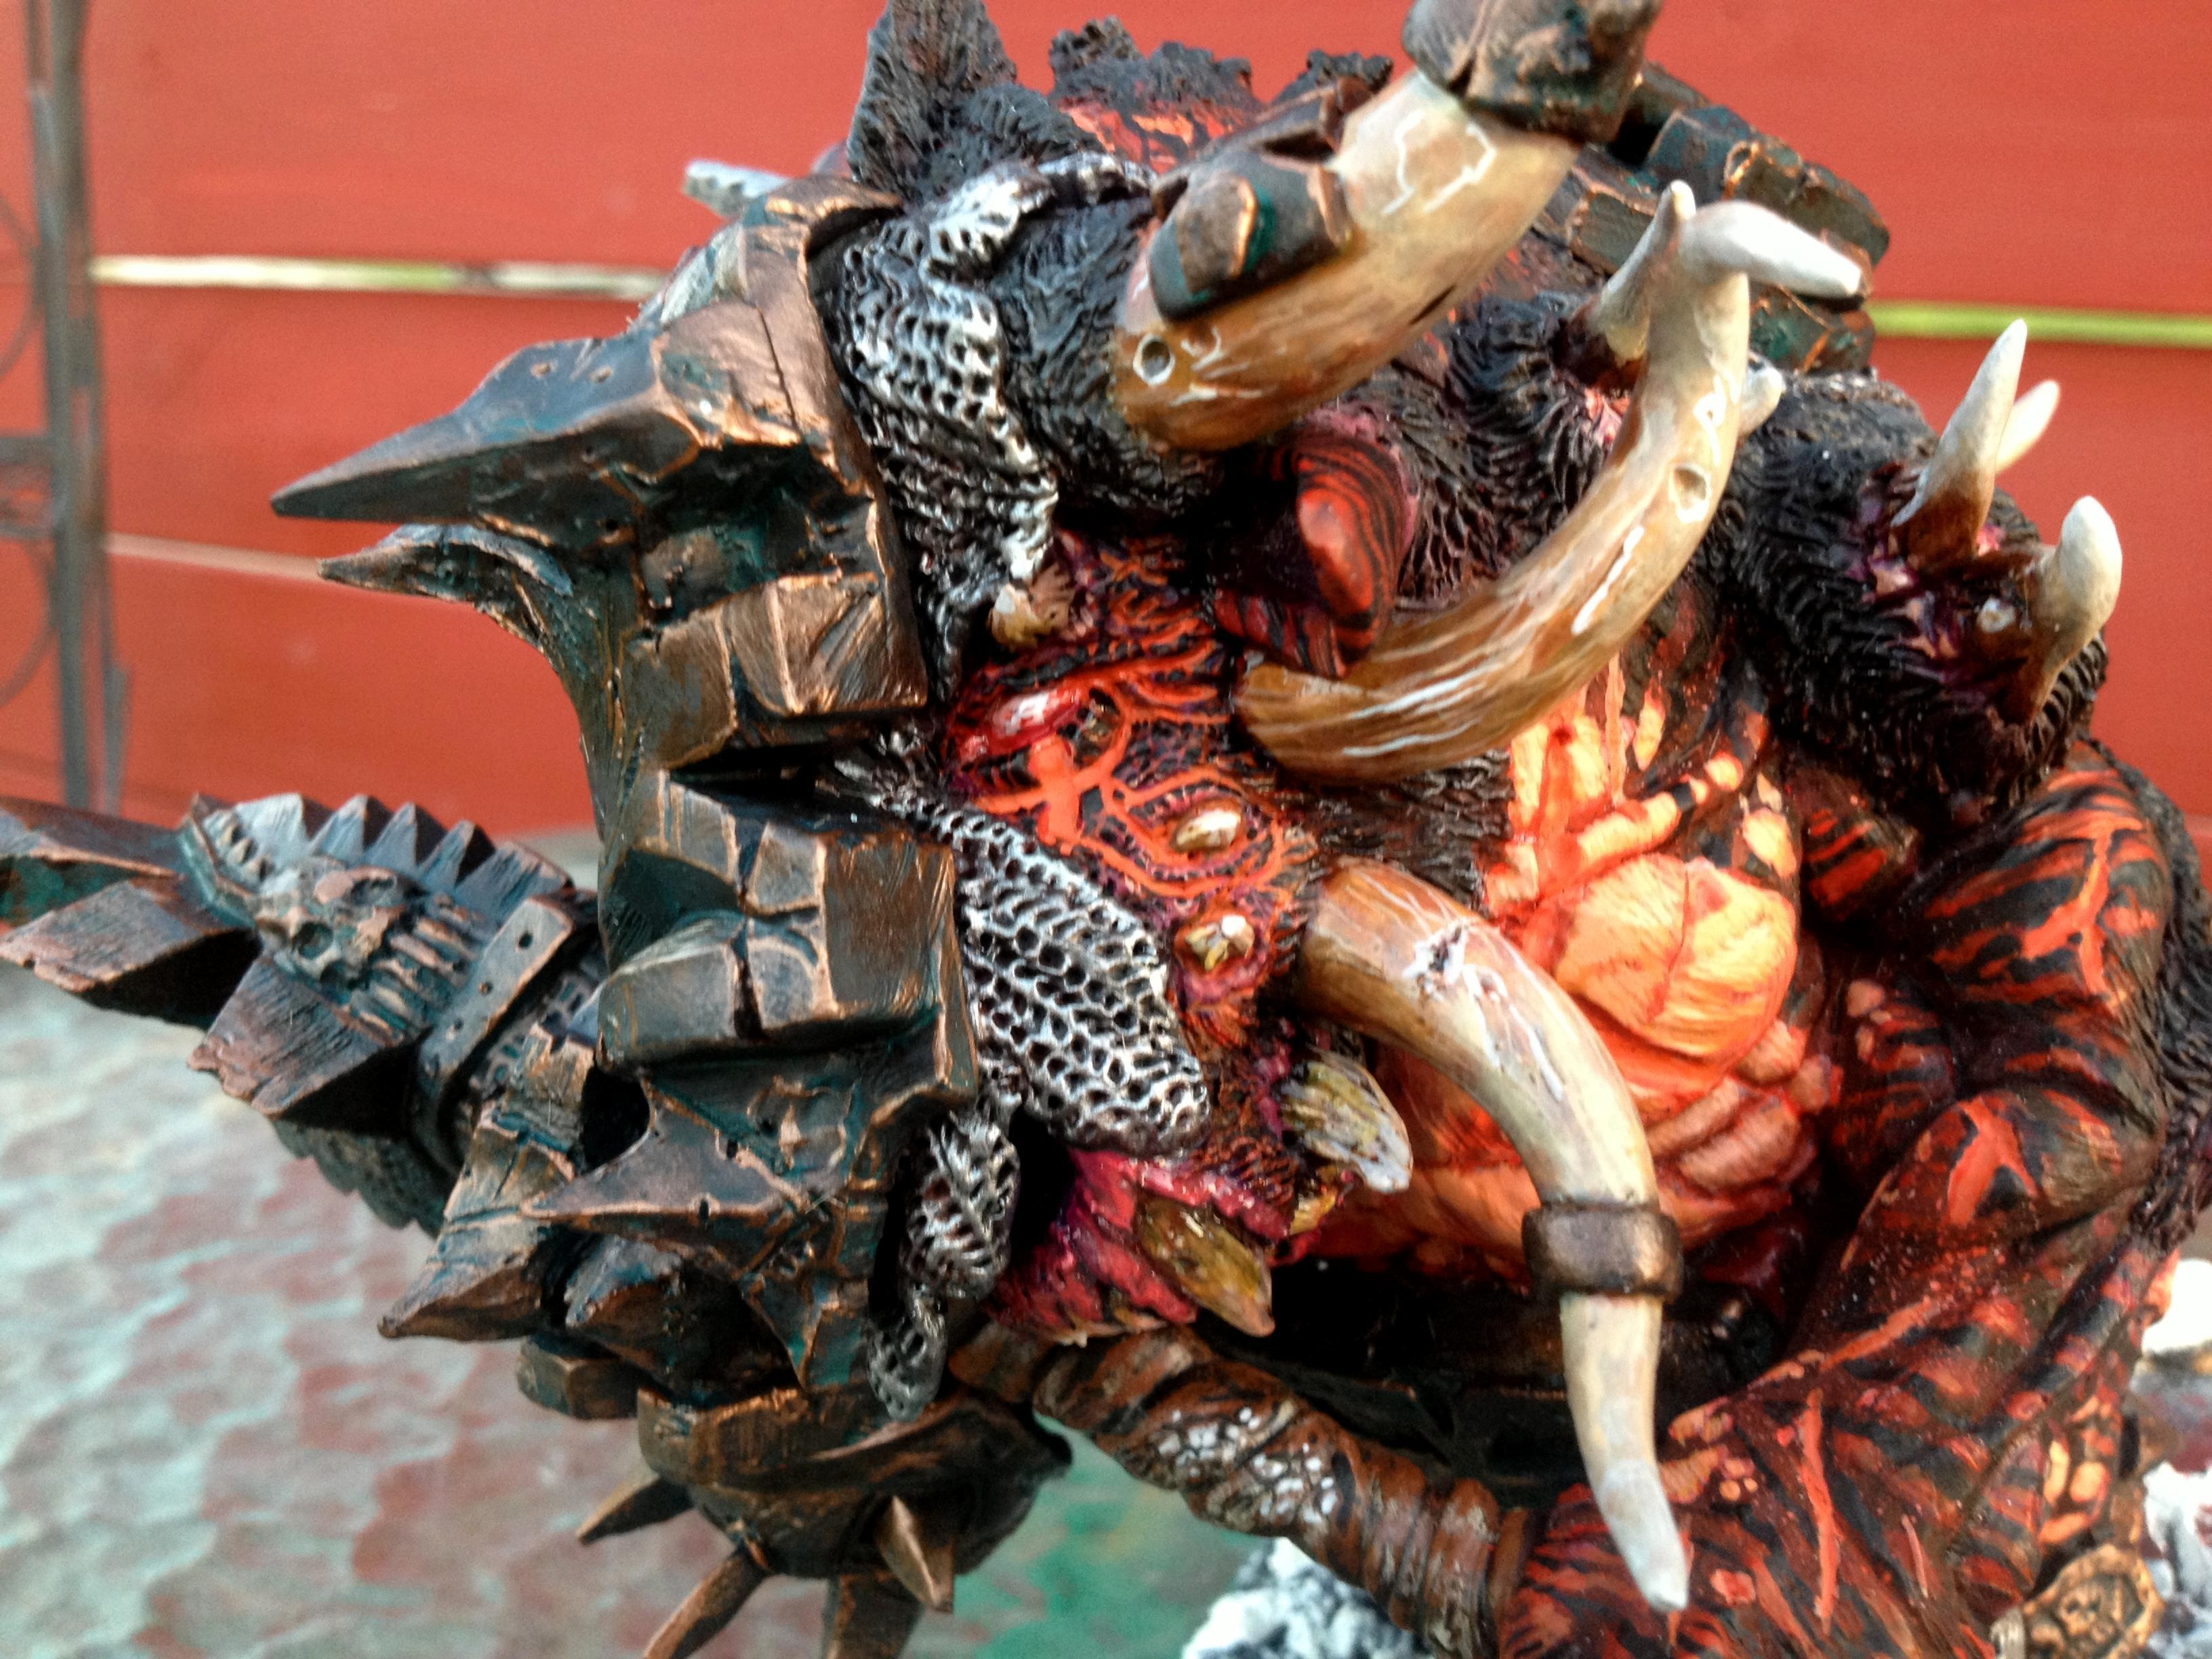 Blood, Bloodthirster, Daemons, Huge, Khorne, Ruins, Scratch Build, Snow, Terminator Armor, Warhammer 40,000, Warhammer Fantasy